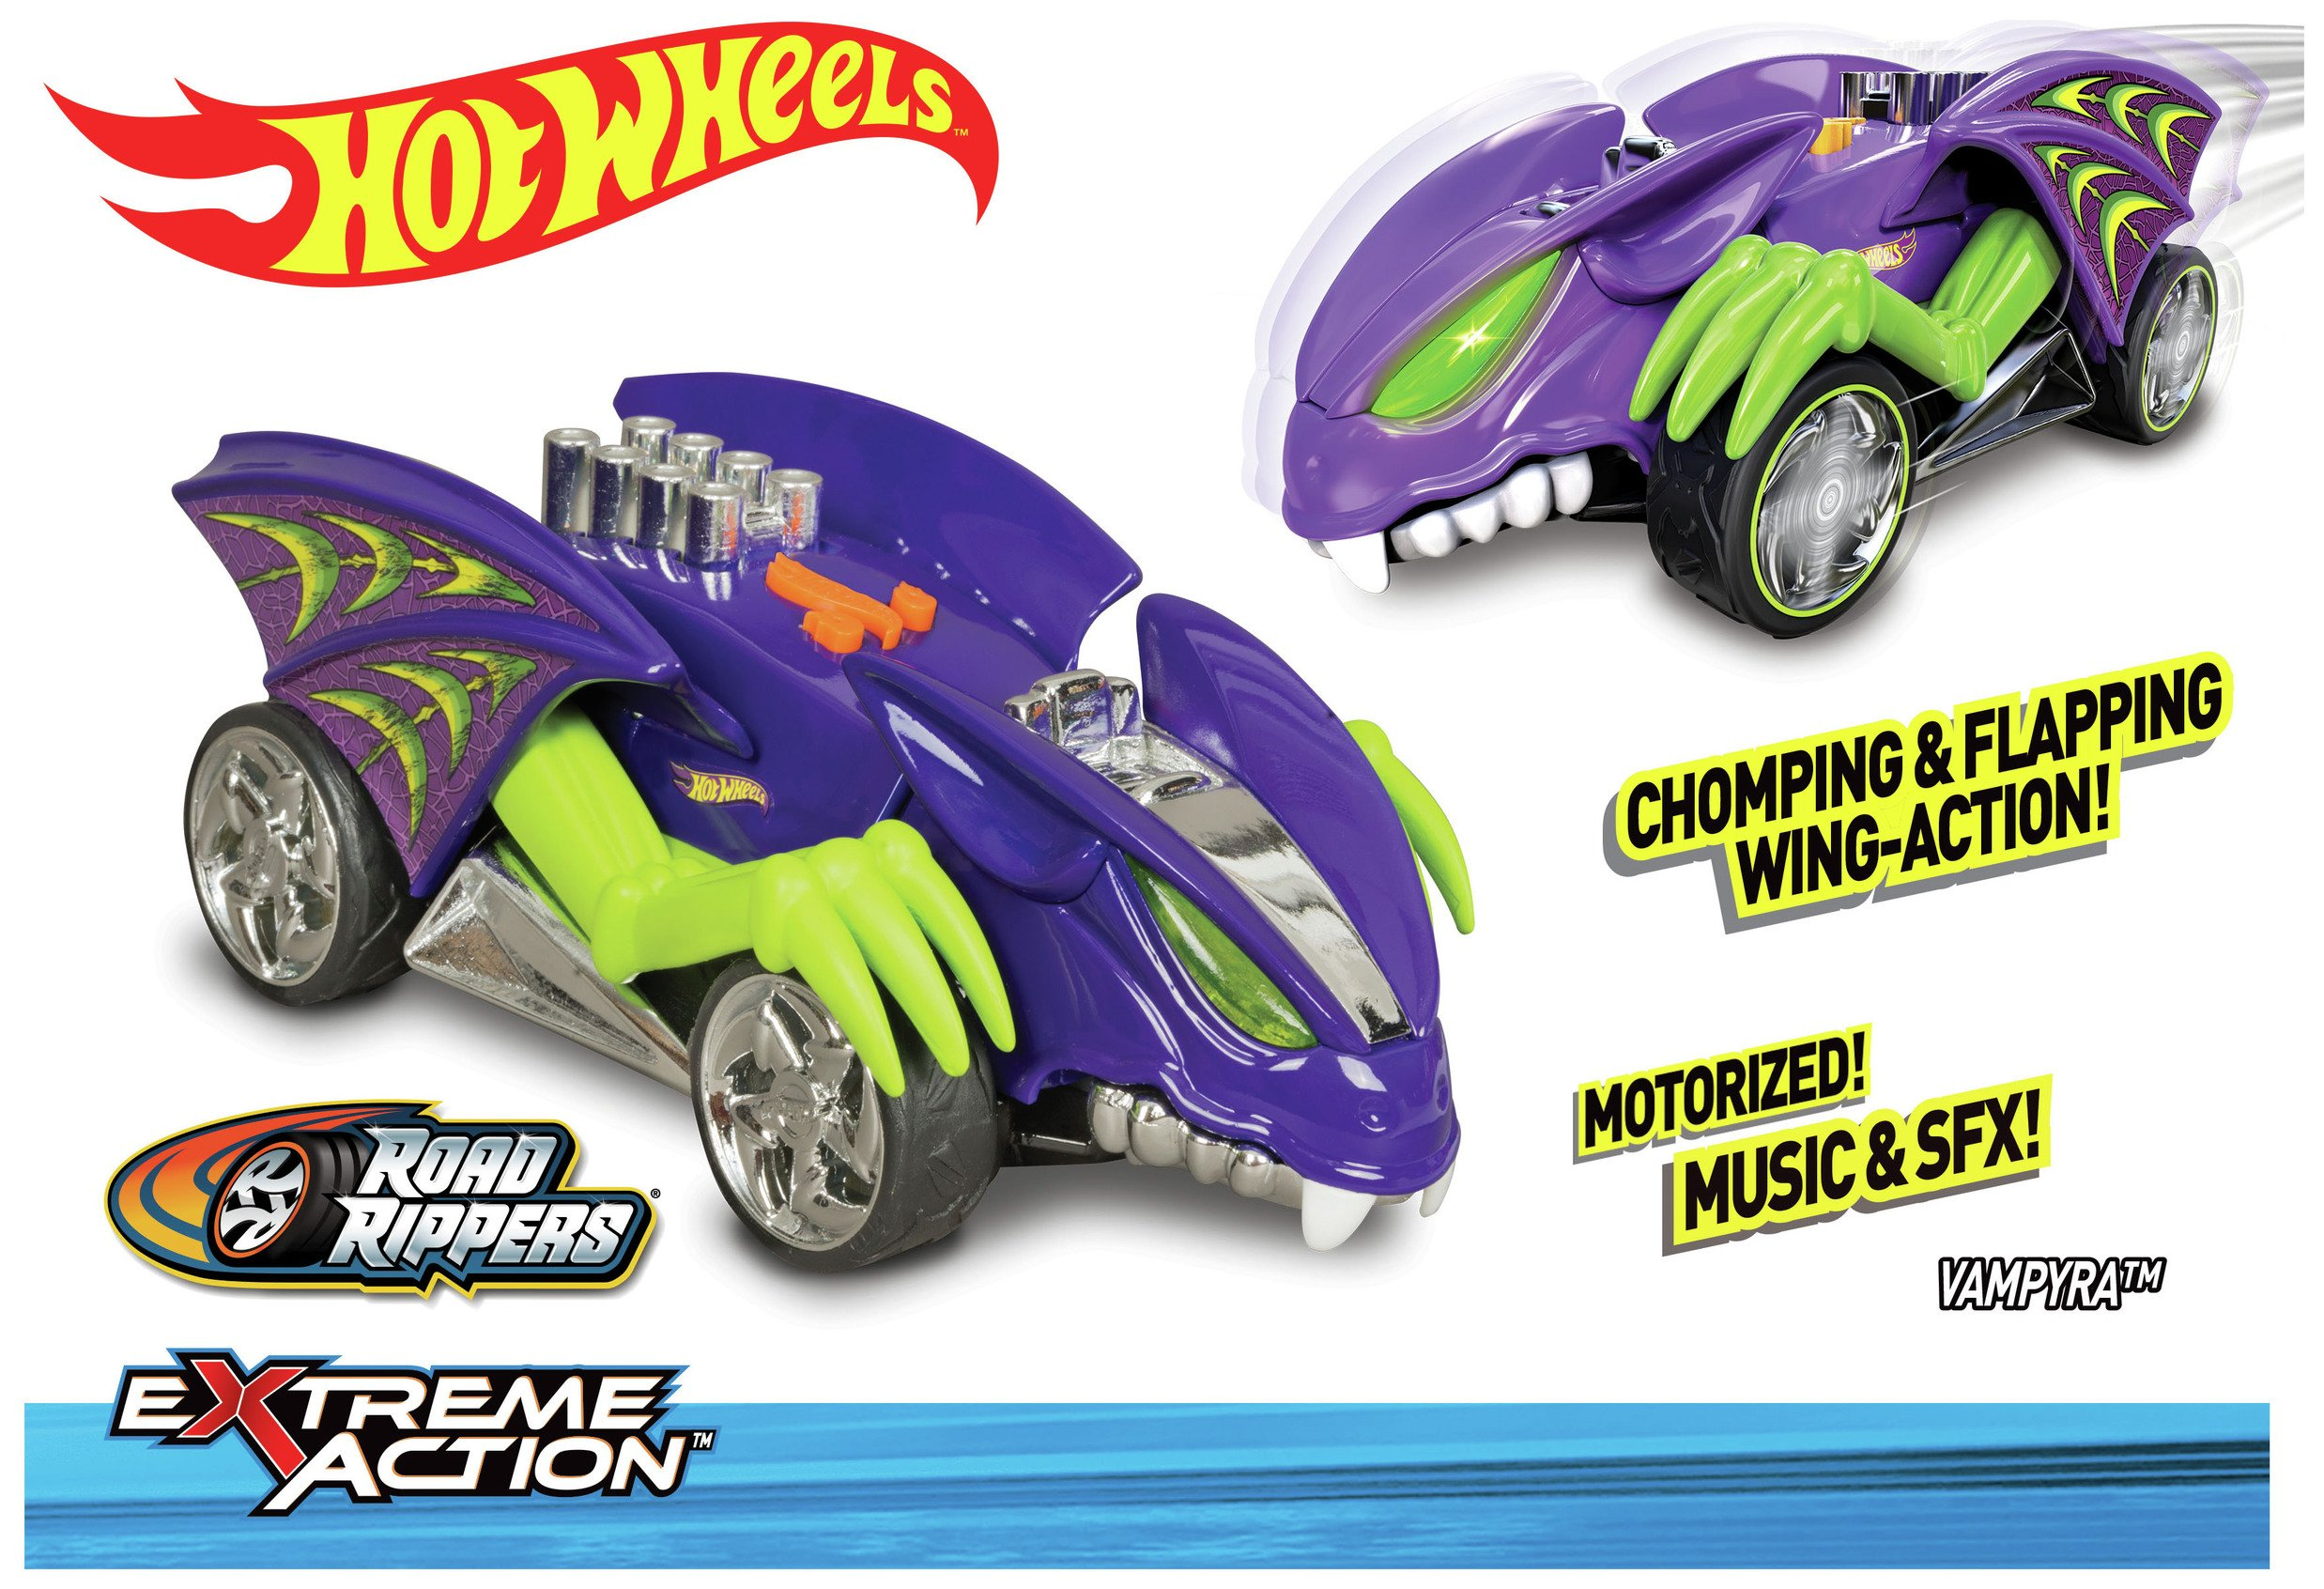 Image of Hot Wheels Exteme Action Vampyra Car.